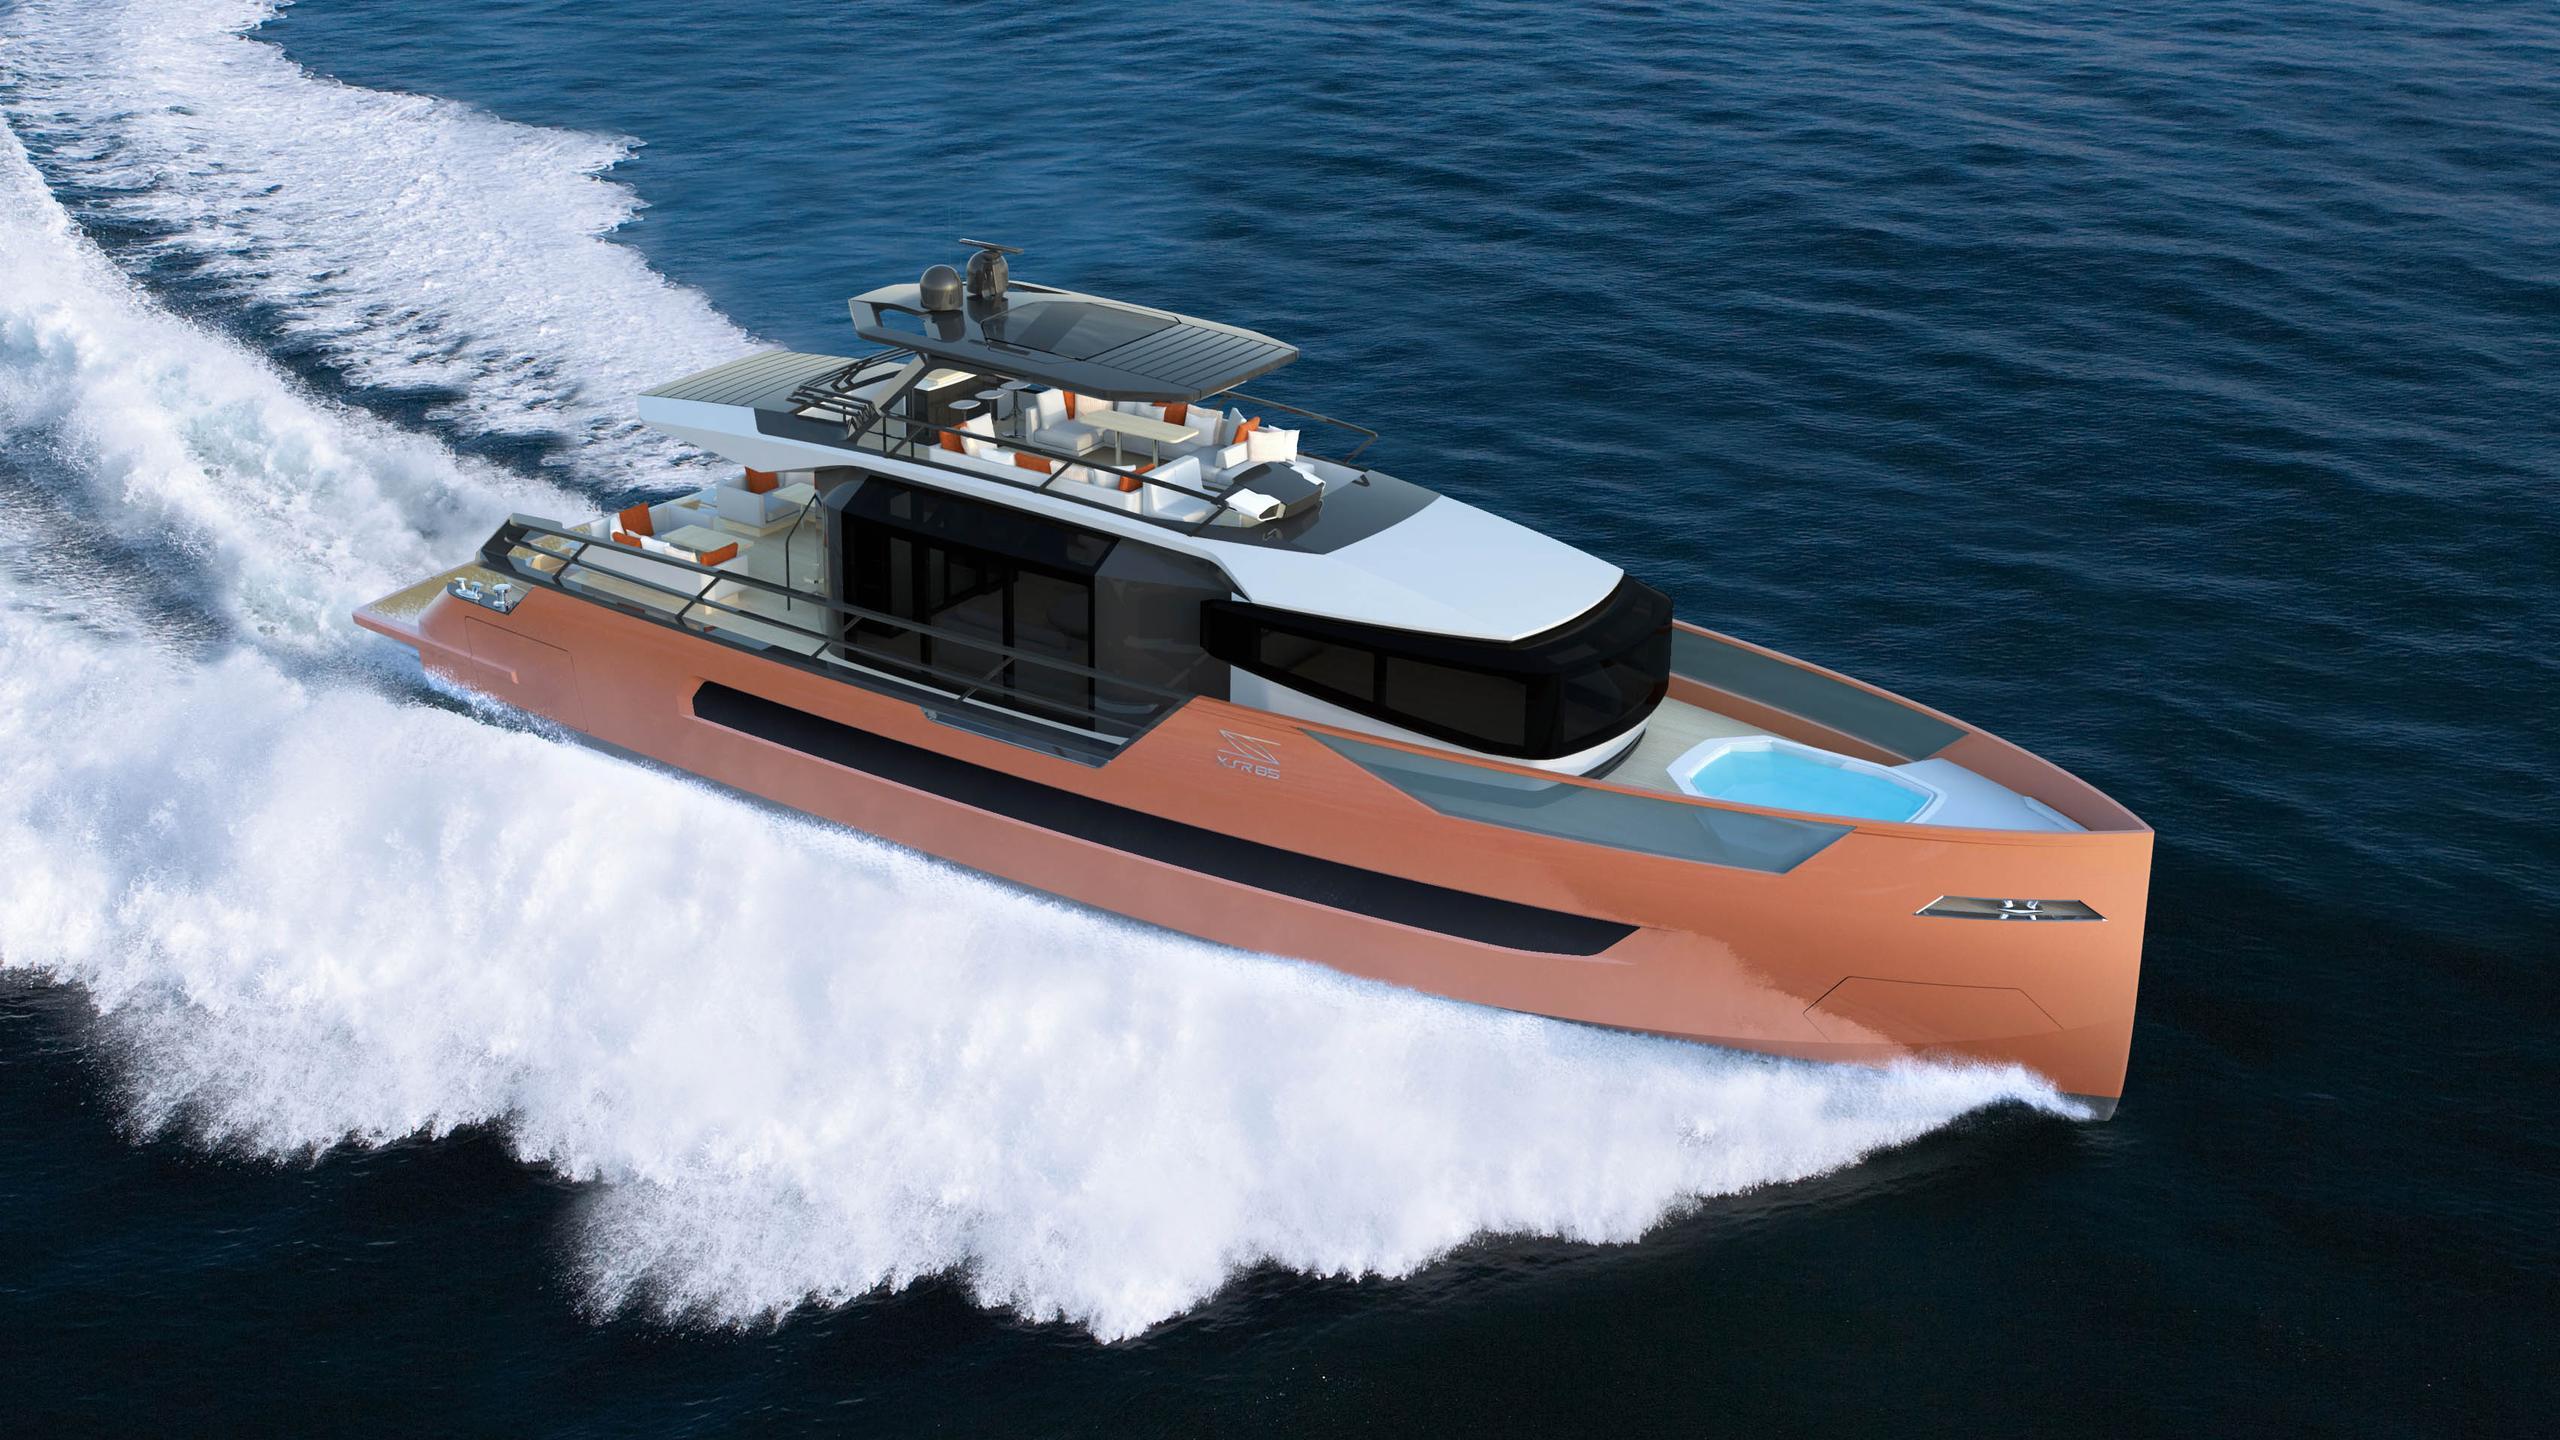 xsr 85 motoryacht sarp yachts 26m 2019 rendering half profile